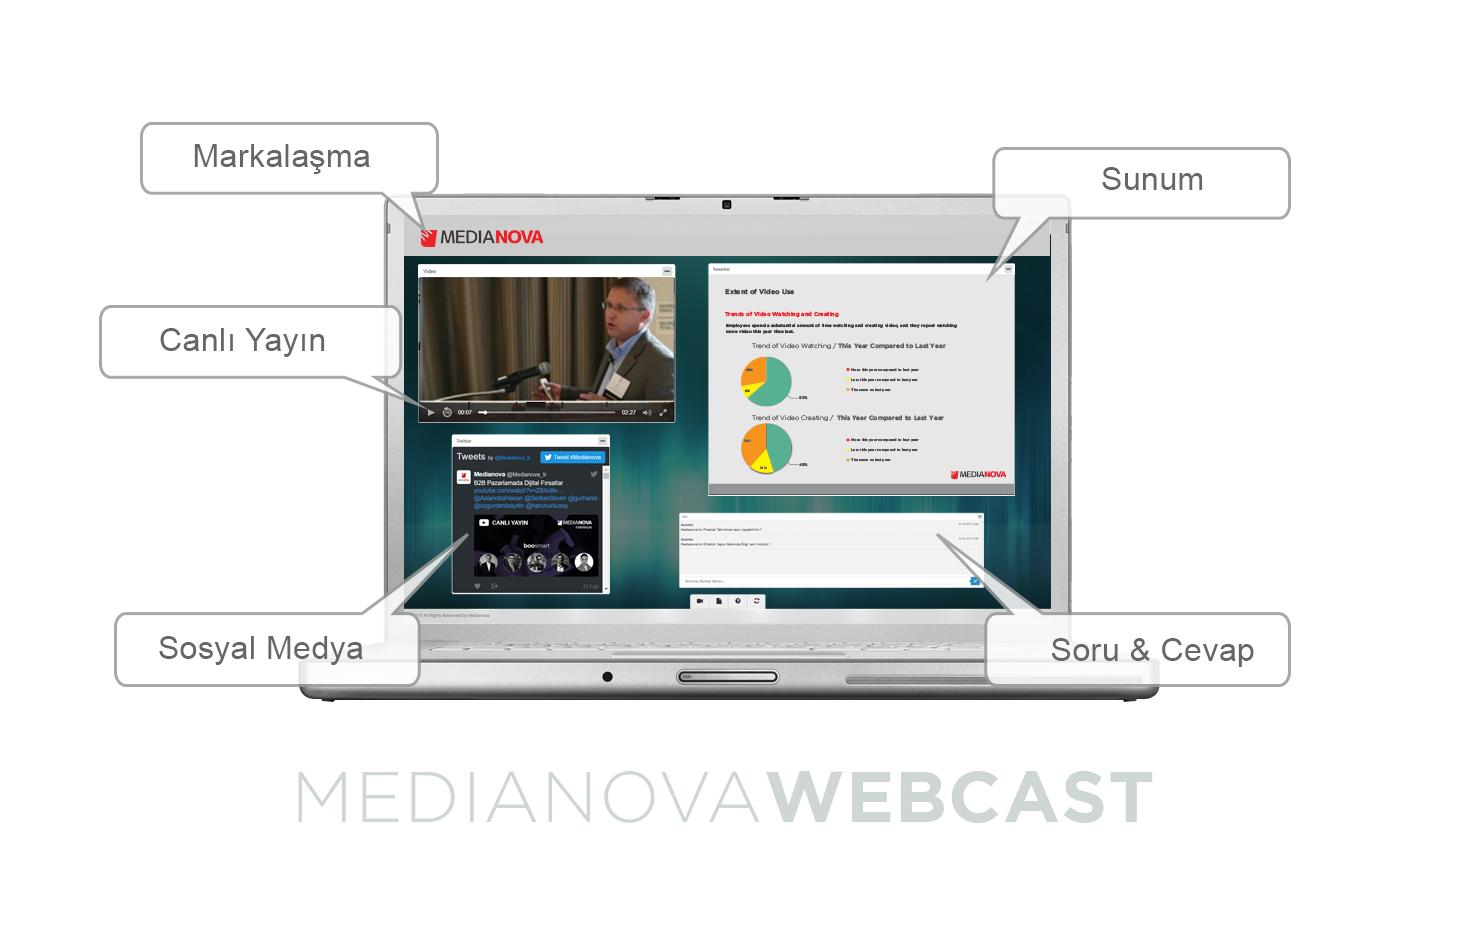 medianova_webcast